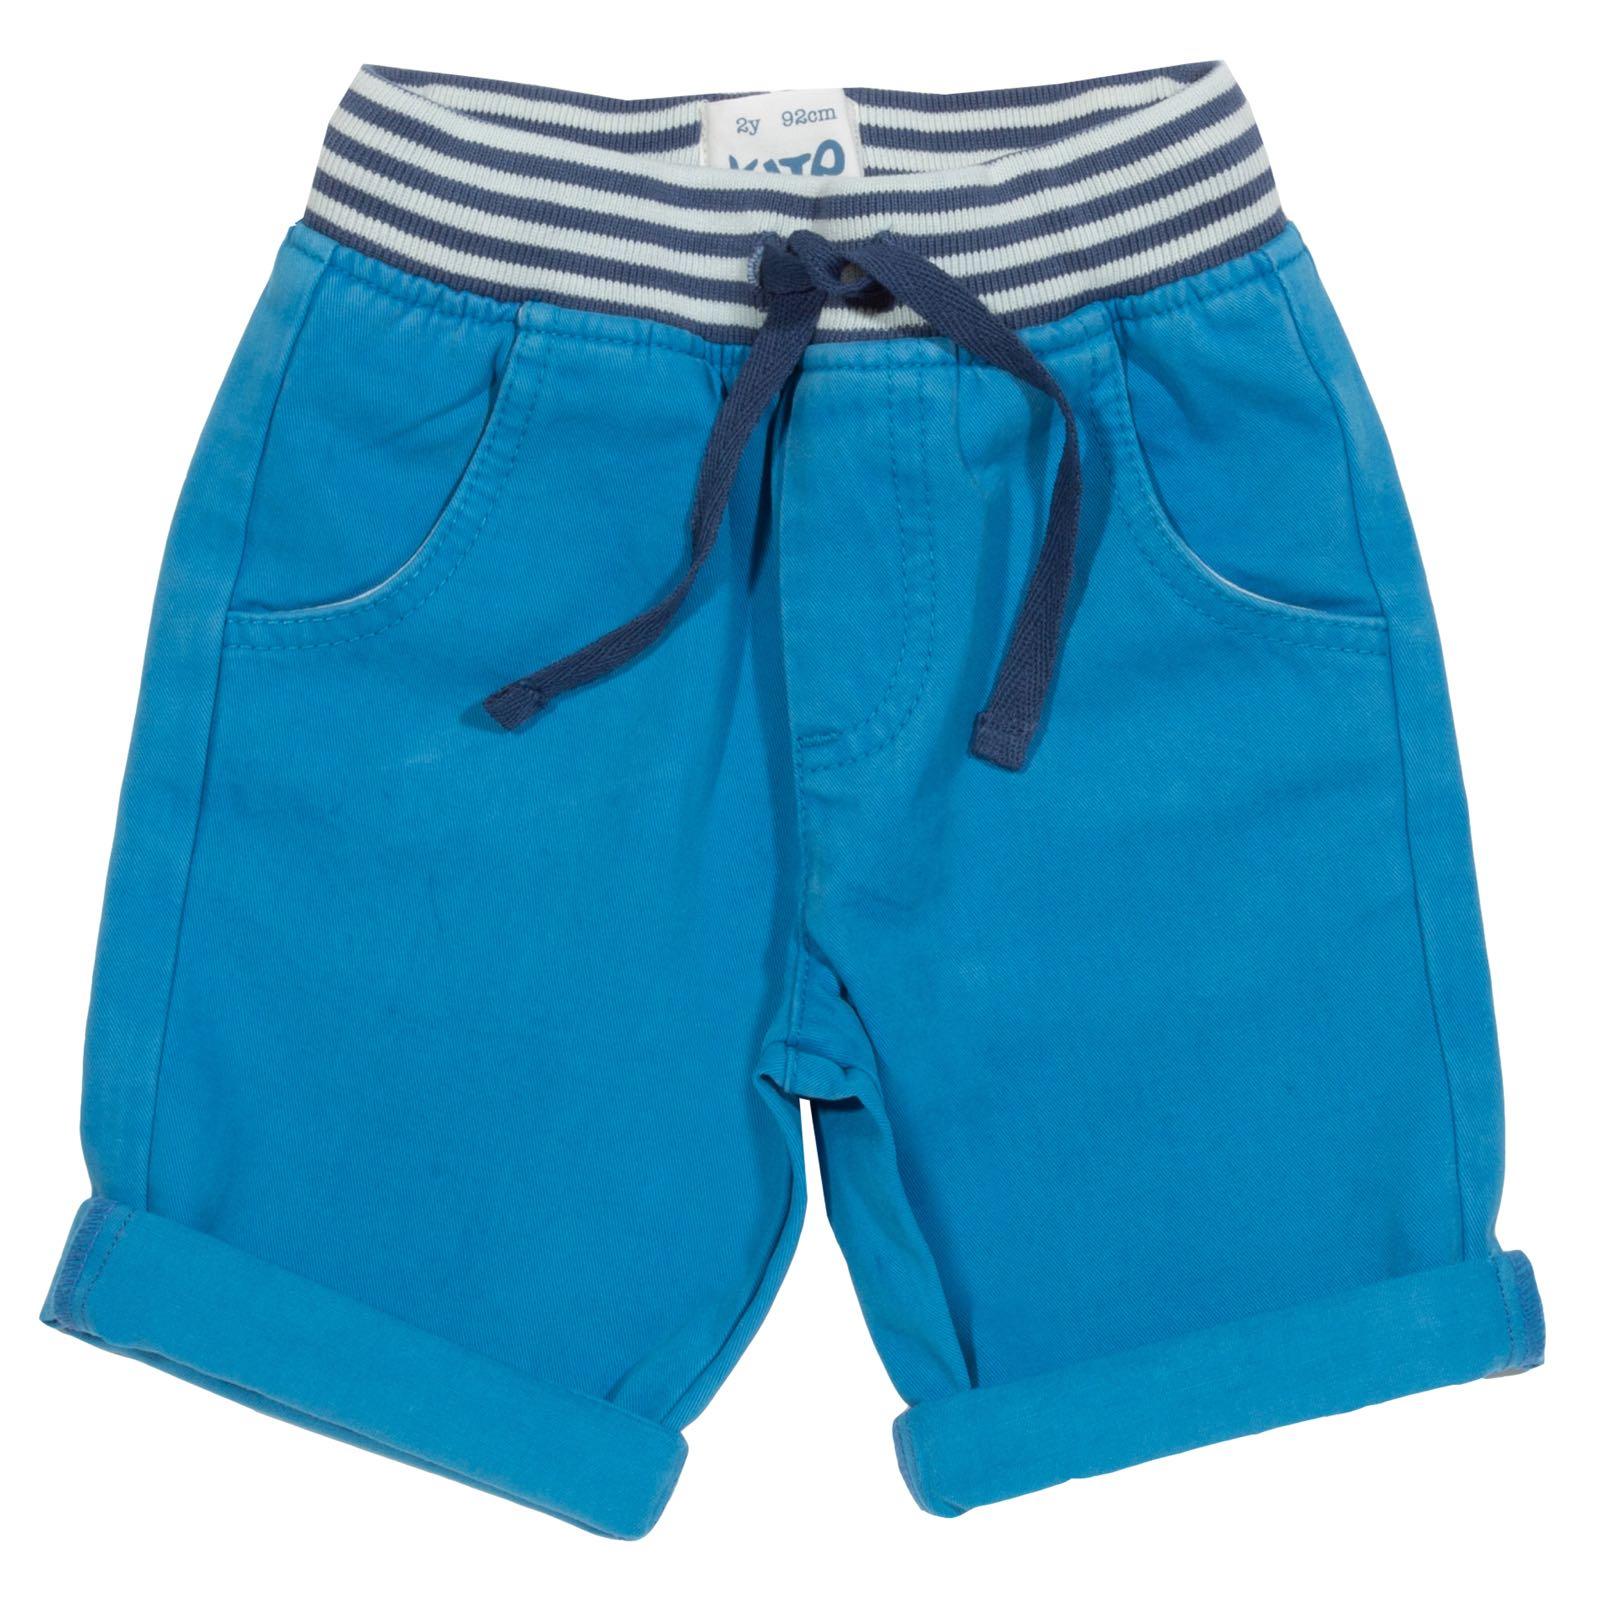 Kite Mini Yacht Shorts, Azure Blue